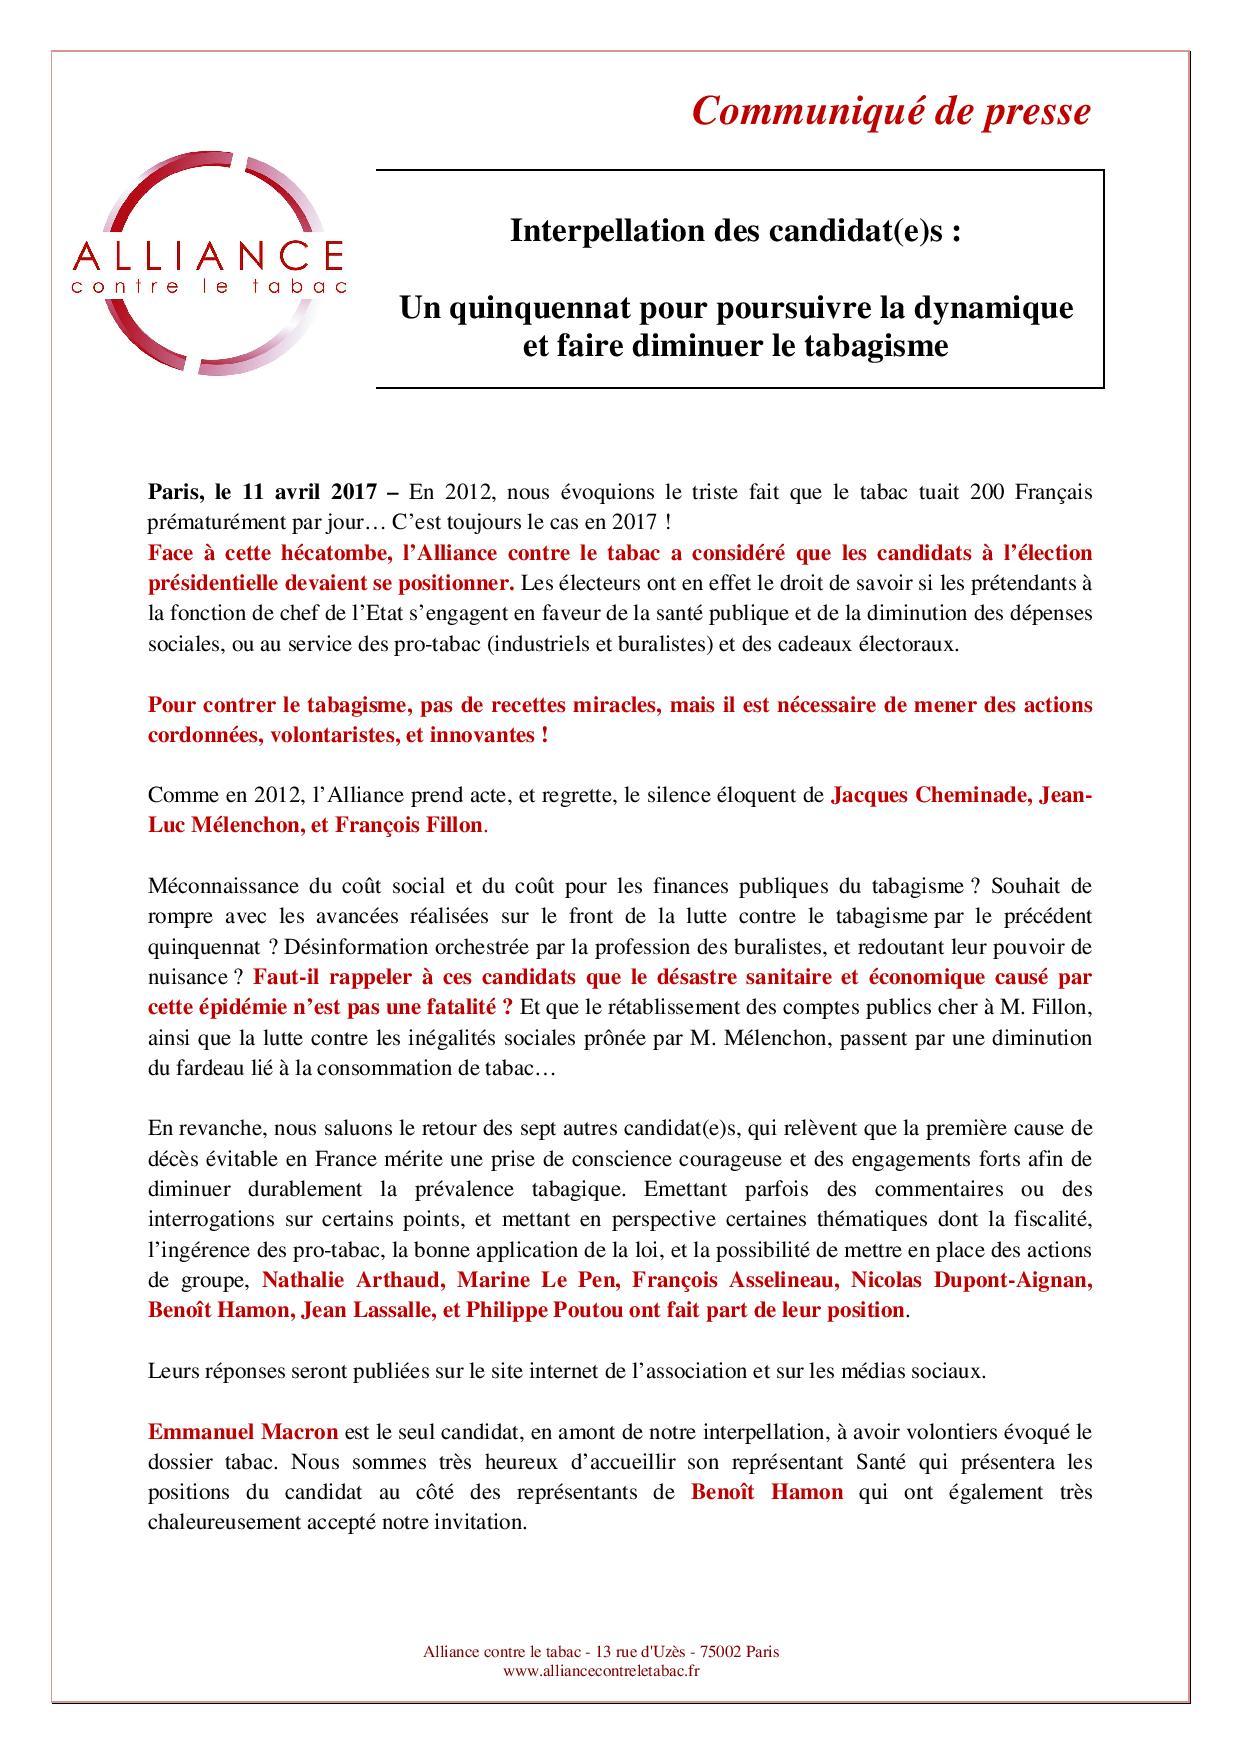 Alliance contre le tabac - DP - 11042017-page-002.jpg